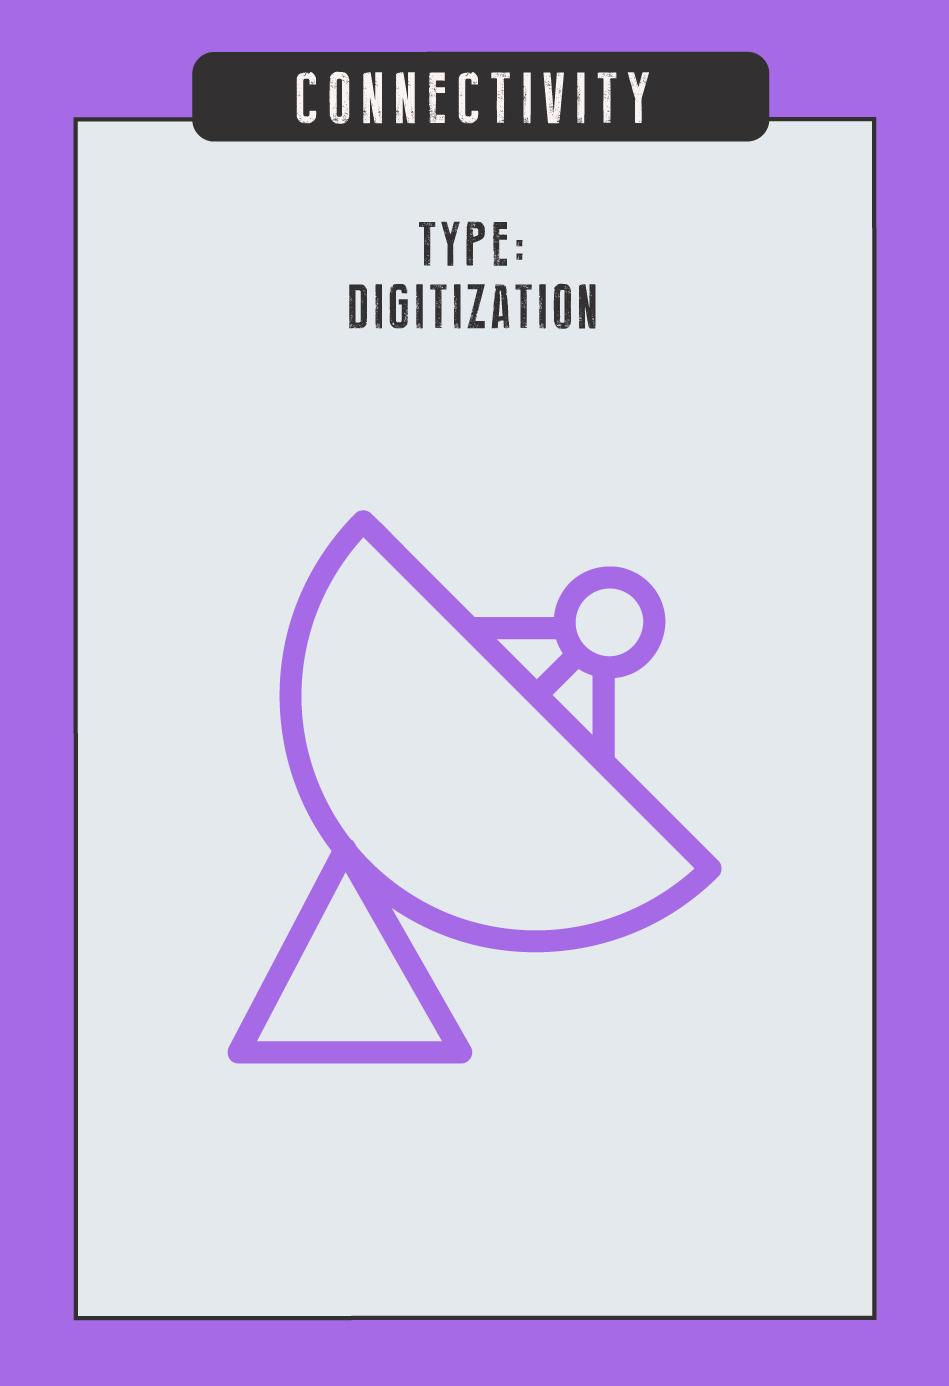 Connectivity card, Type: Digitization